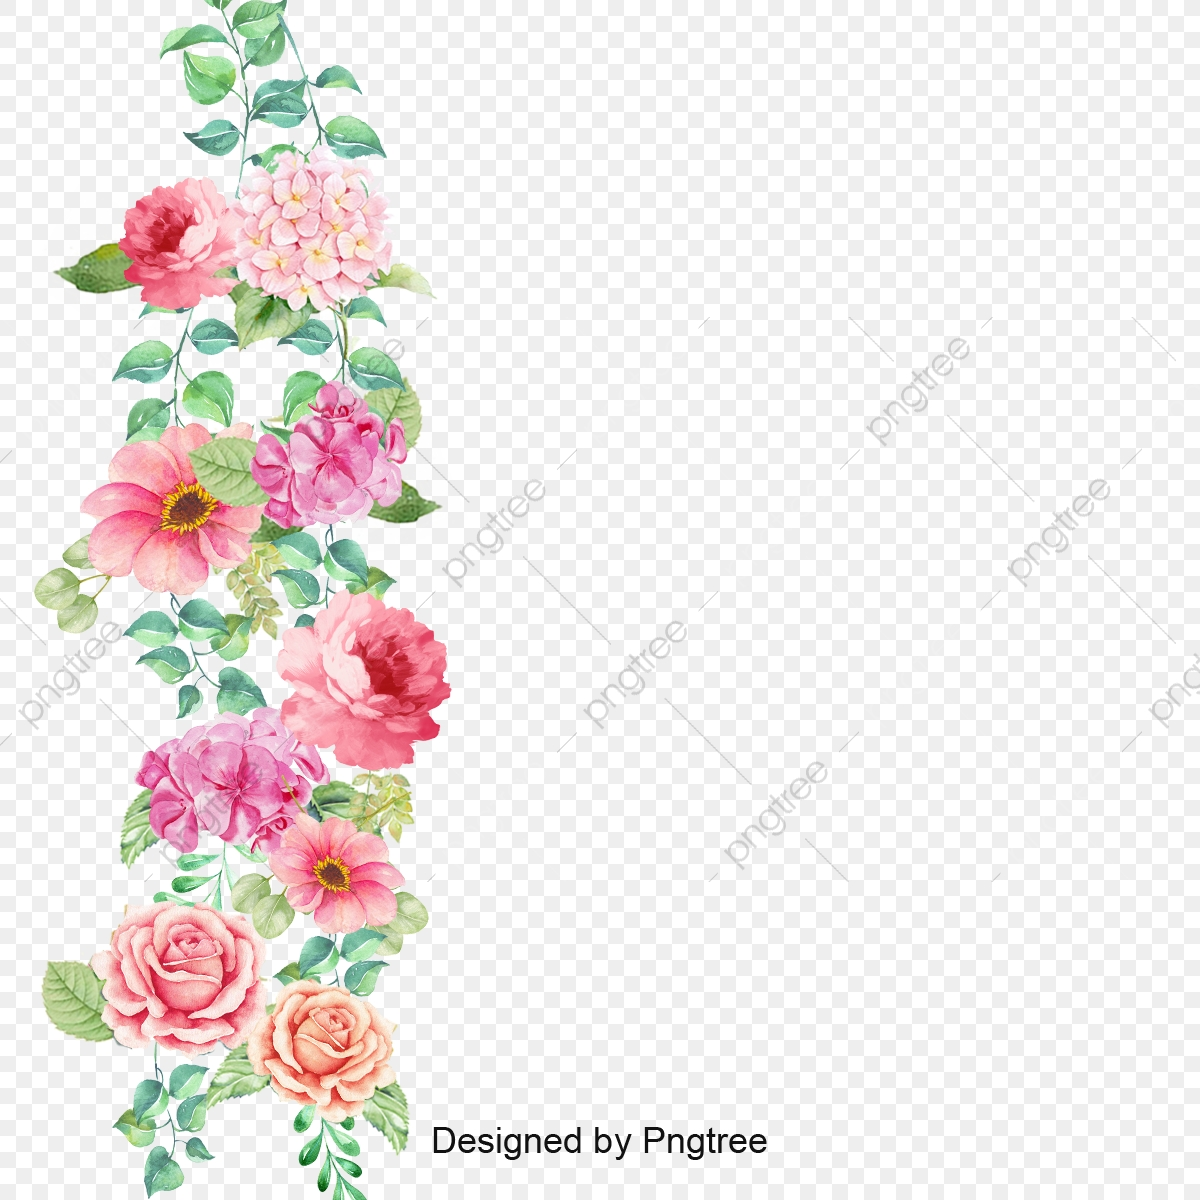 flower border vector flower pansy background png transparent clipart image and psd file for free download https pngtree com freepng flower border vector 3552632 html